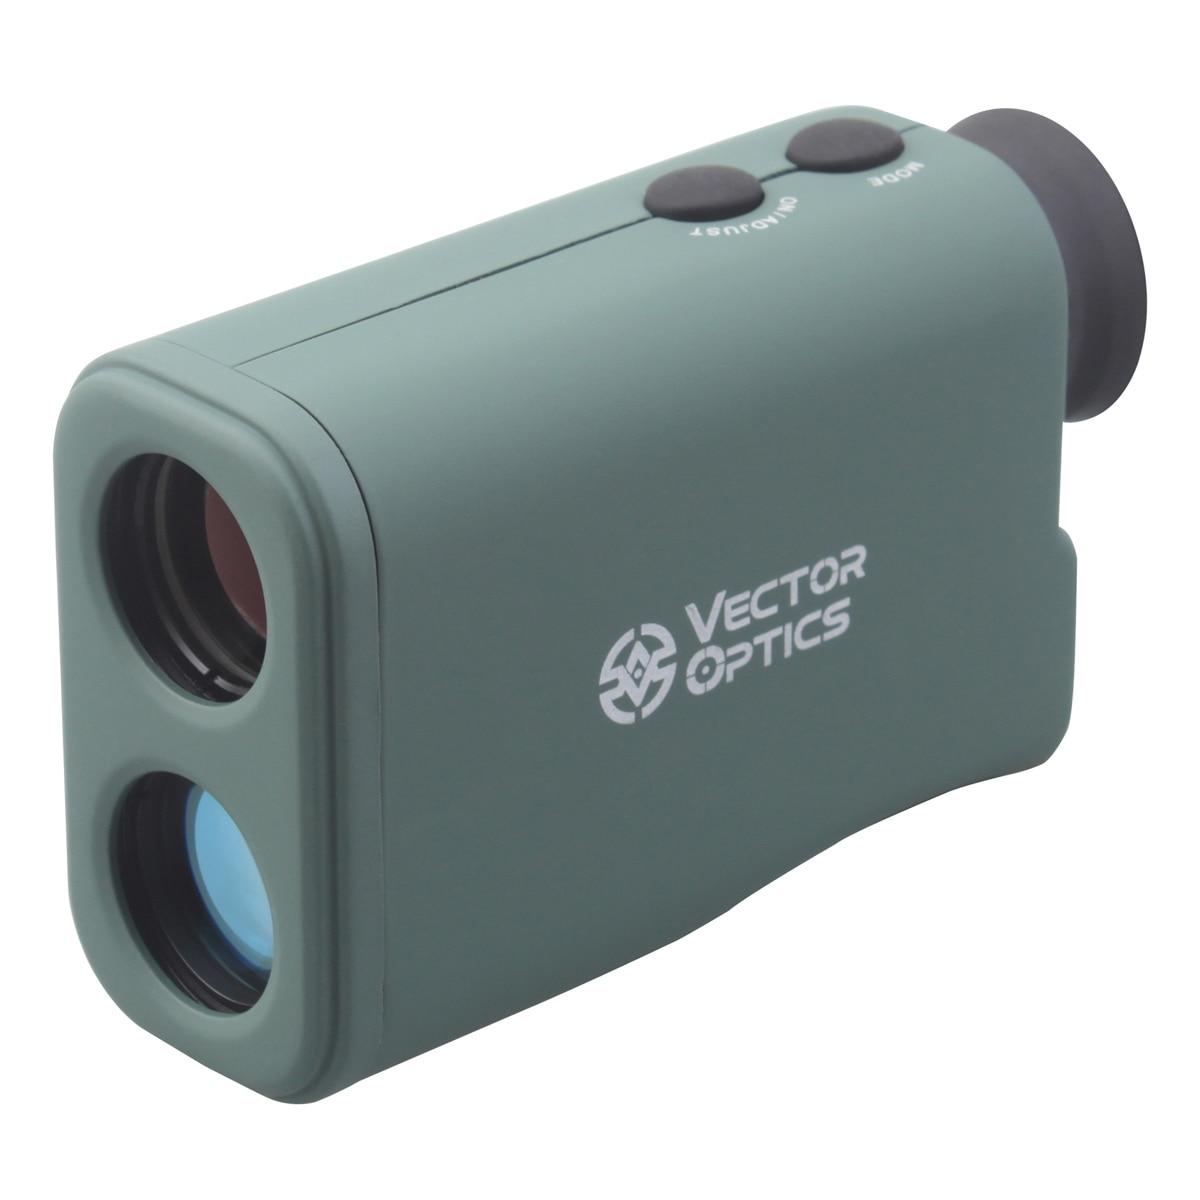 Free Shipping Vector Optics Hunting 6x25 Laser Range Finder Monocular 650M Rangefinder Distance Meter 3 Modes